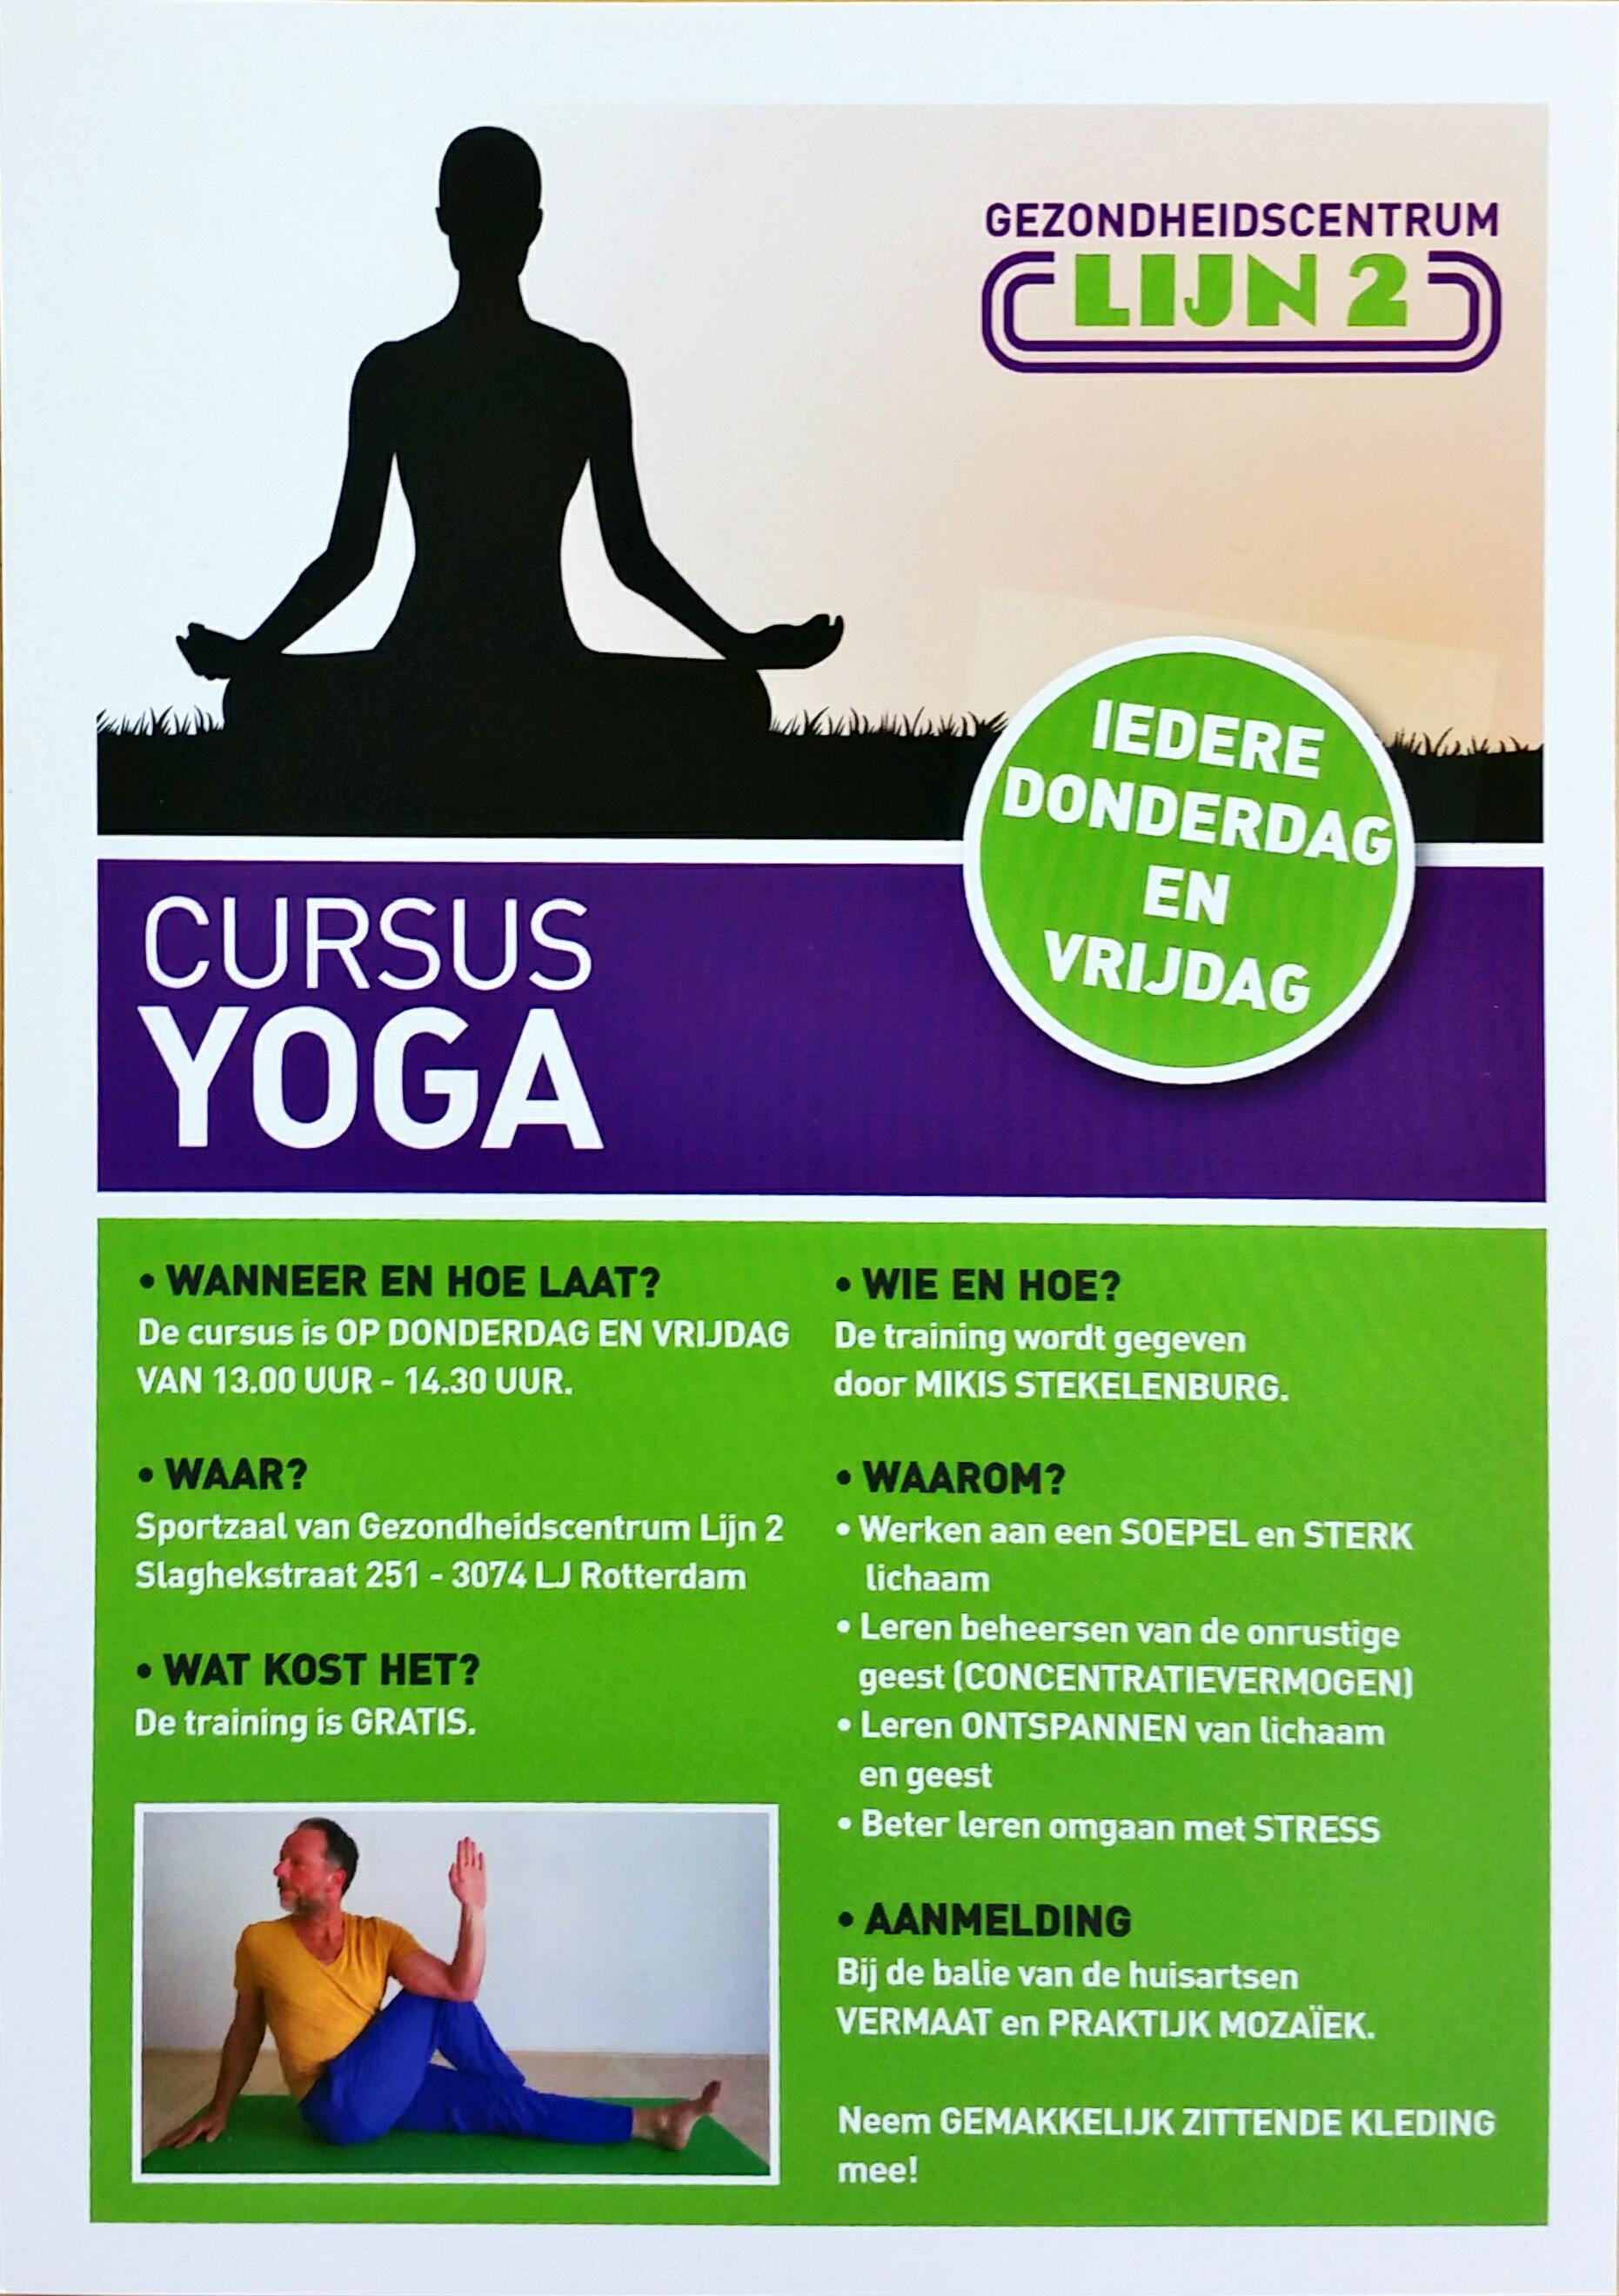 https://www.praktijkmozaiek.nl/media/cursus_yoga.jpg